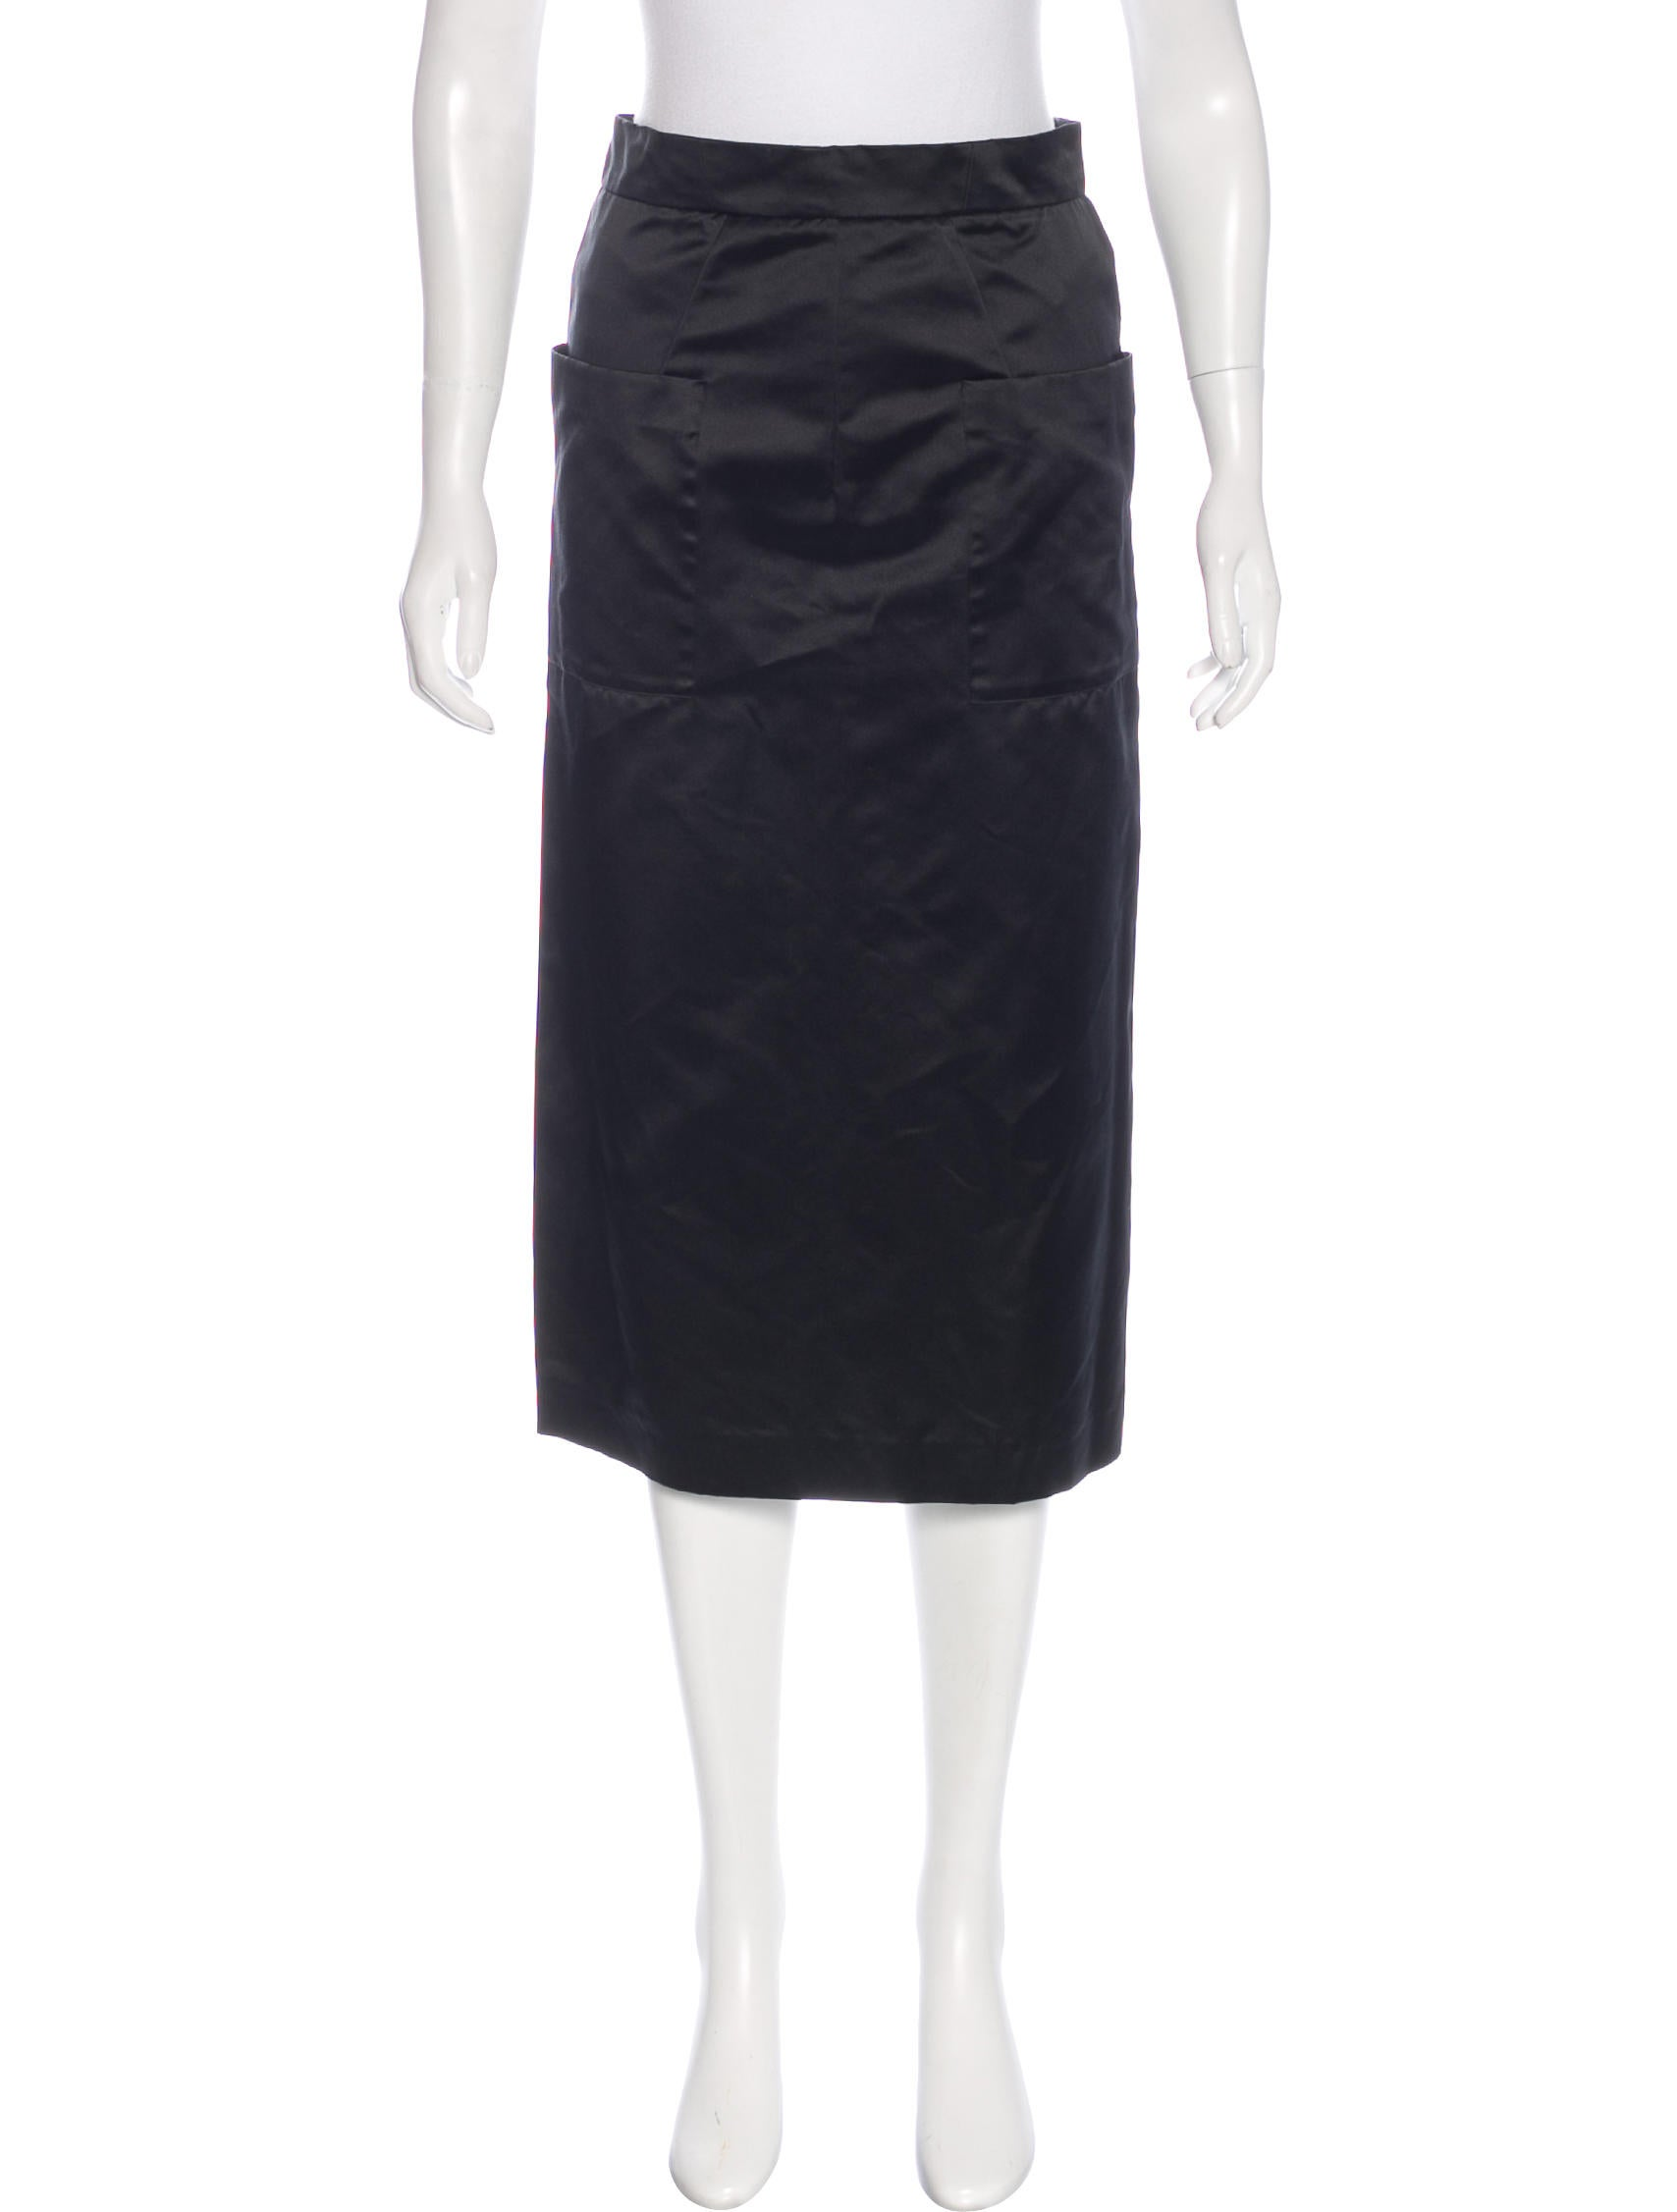 prada satin pencil skirt clothing pra143138 the realreal